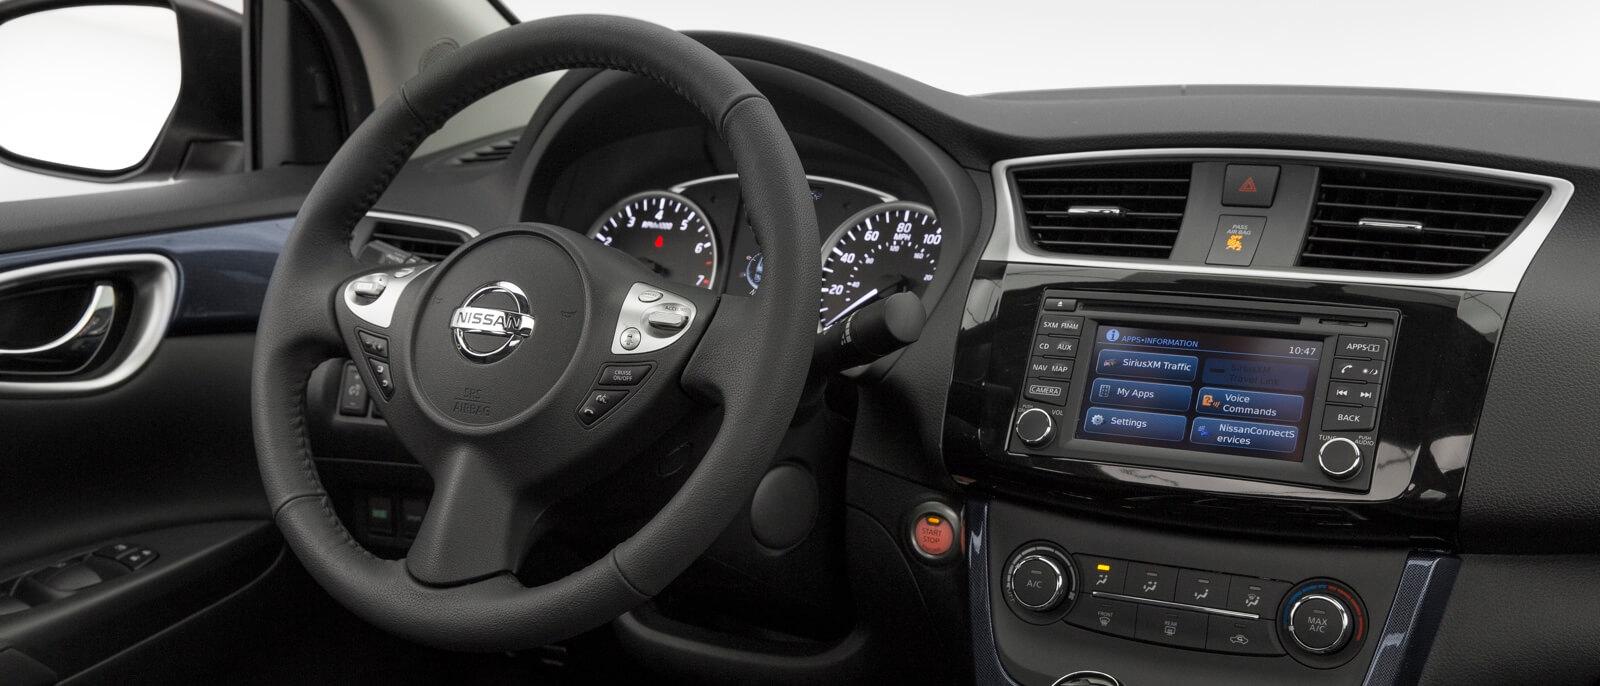 2016 Nissan Sentra front interior